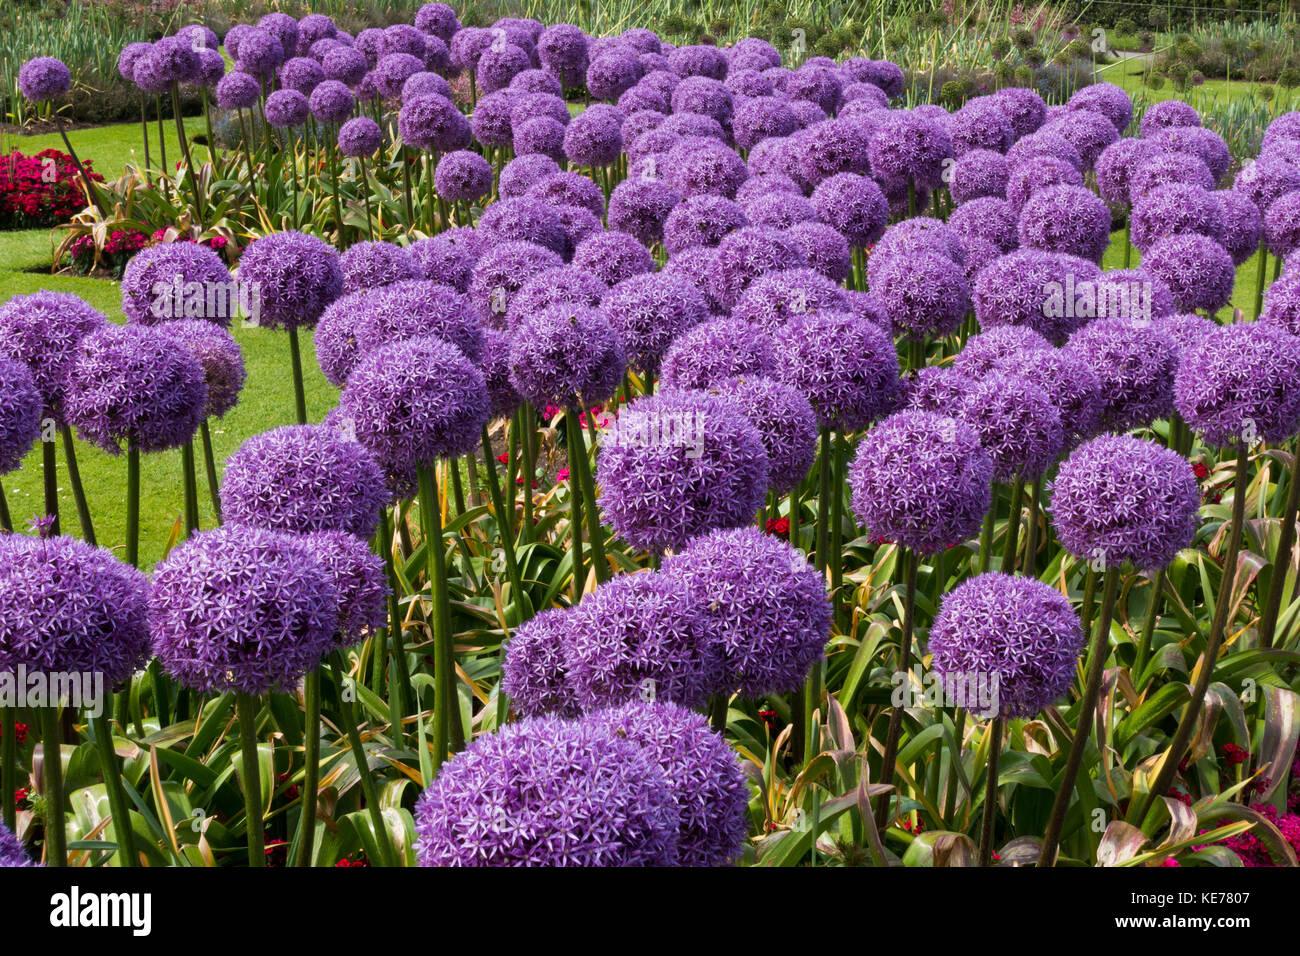 Purple Alliums - Stock Image